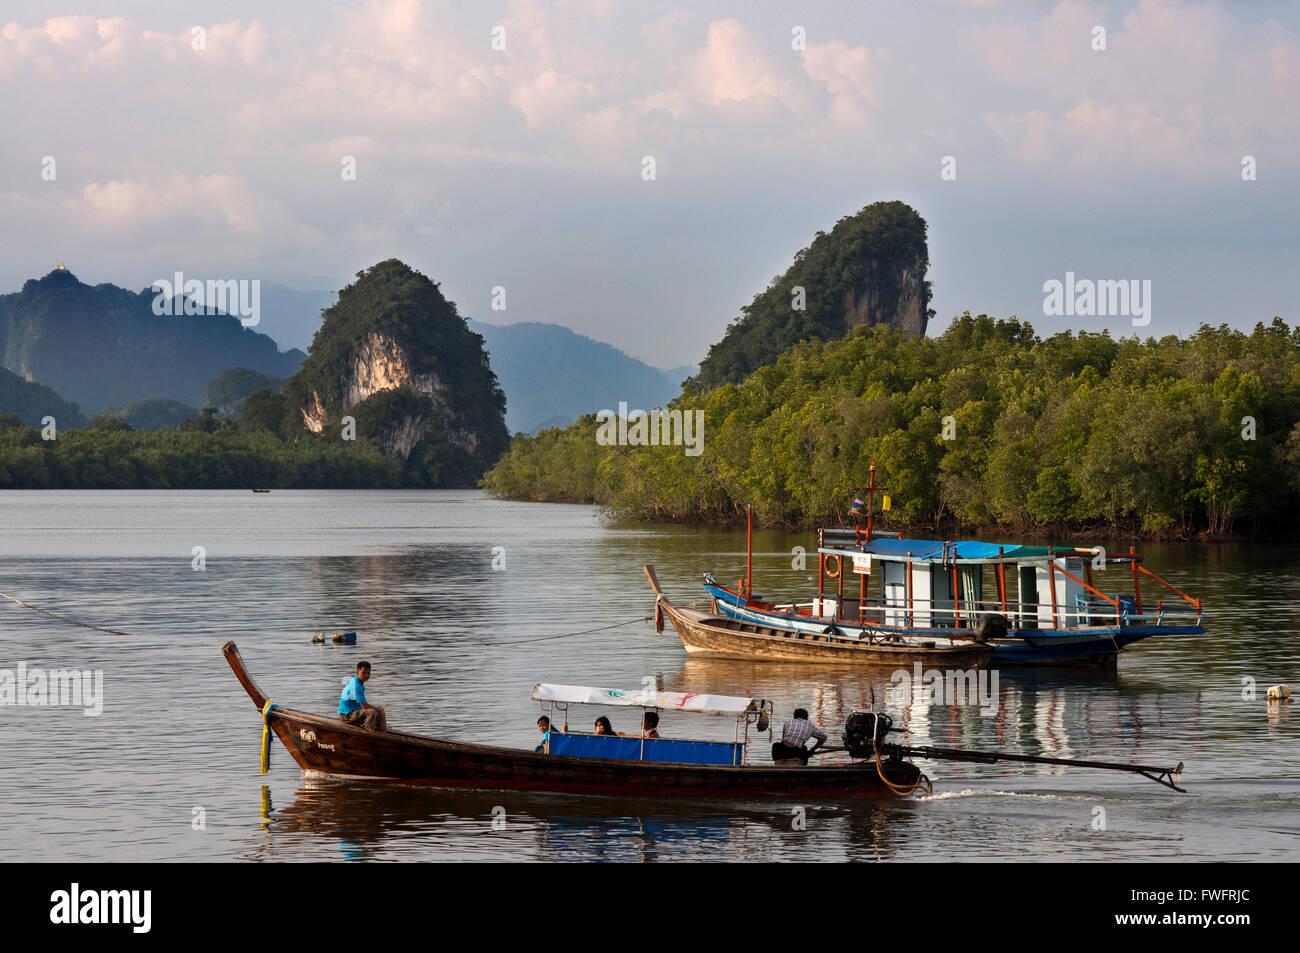 Khao Khanap Nam. Río Krabi y Kanab Nam Twin Peaks en la distancia, la ciudad de Krabi, la provincia de Krabi, Tailandia, Foto de stock